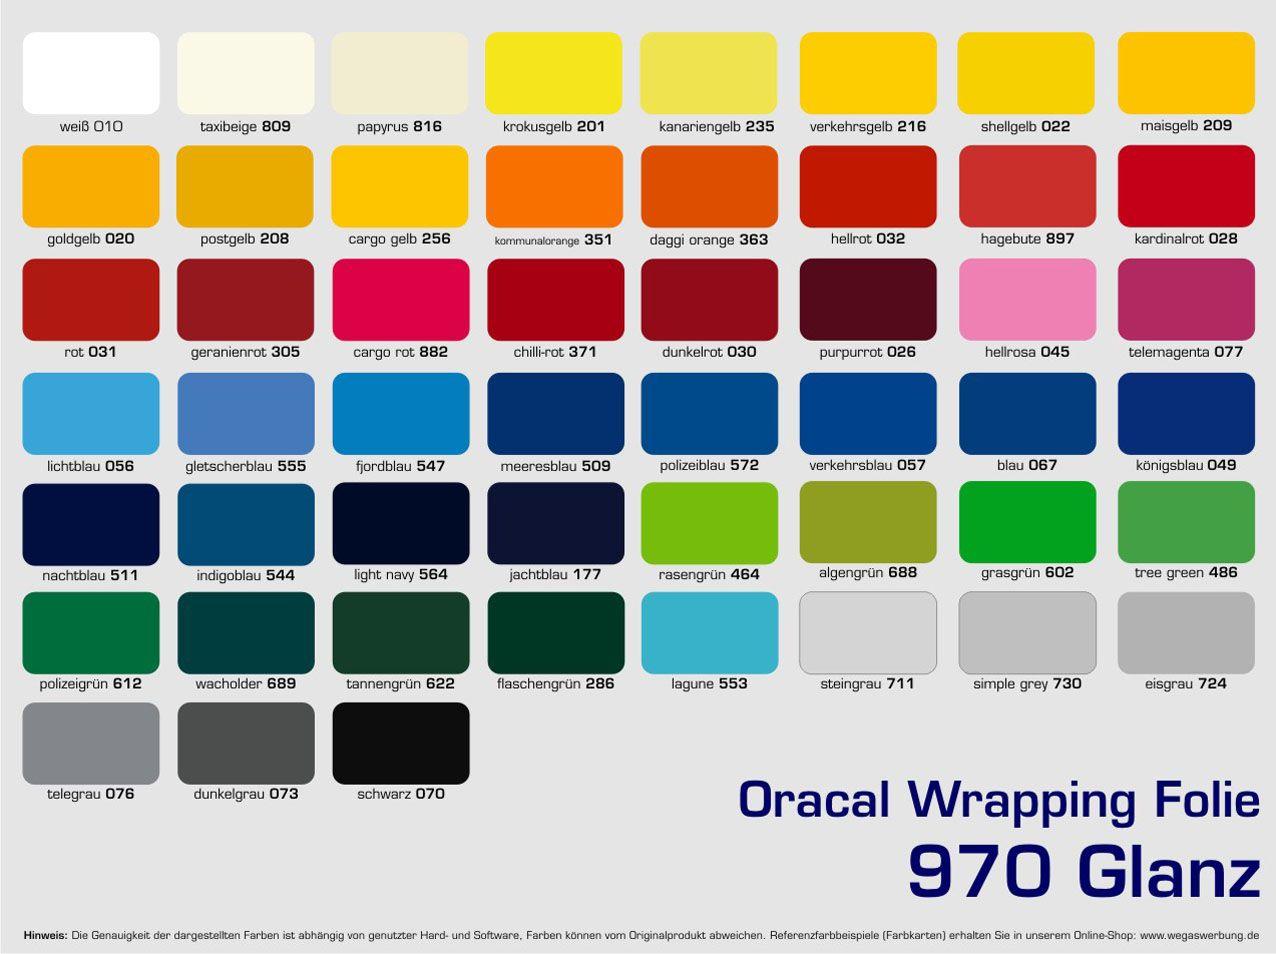 Folieren Farben Google Suche Folie Ren